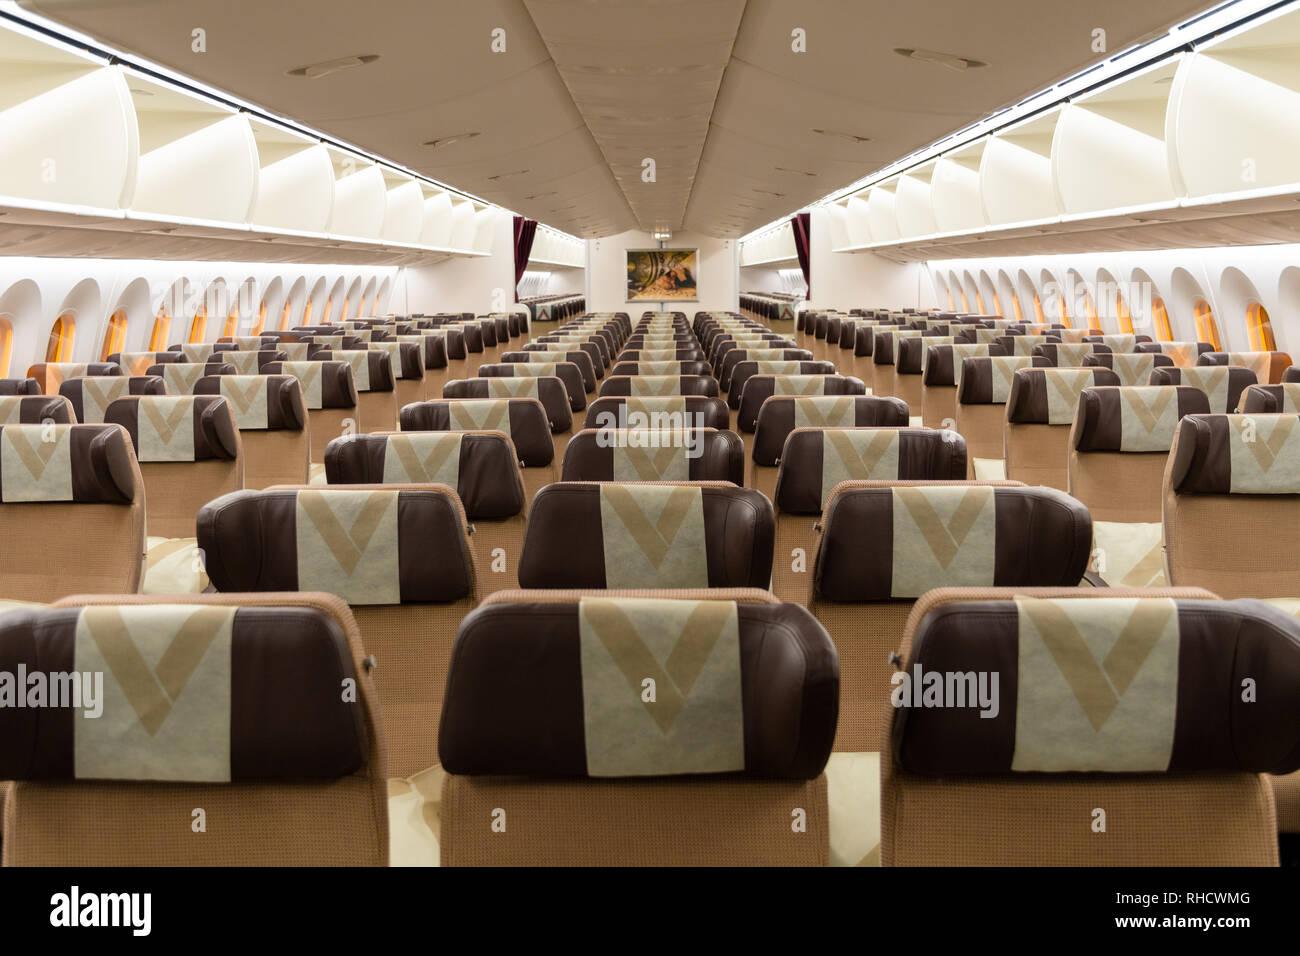 Boeing 787 Dreamliner Interior Stock Photos & Boeing 787